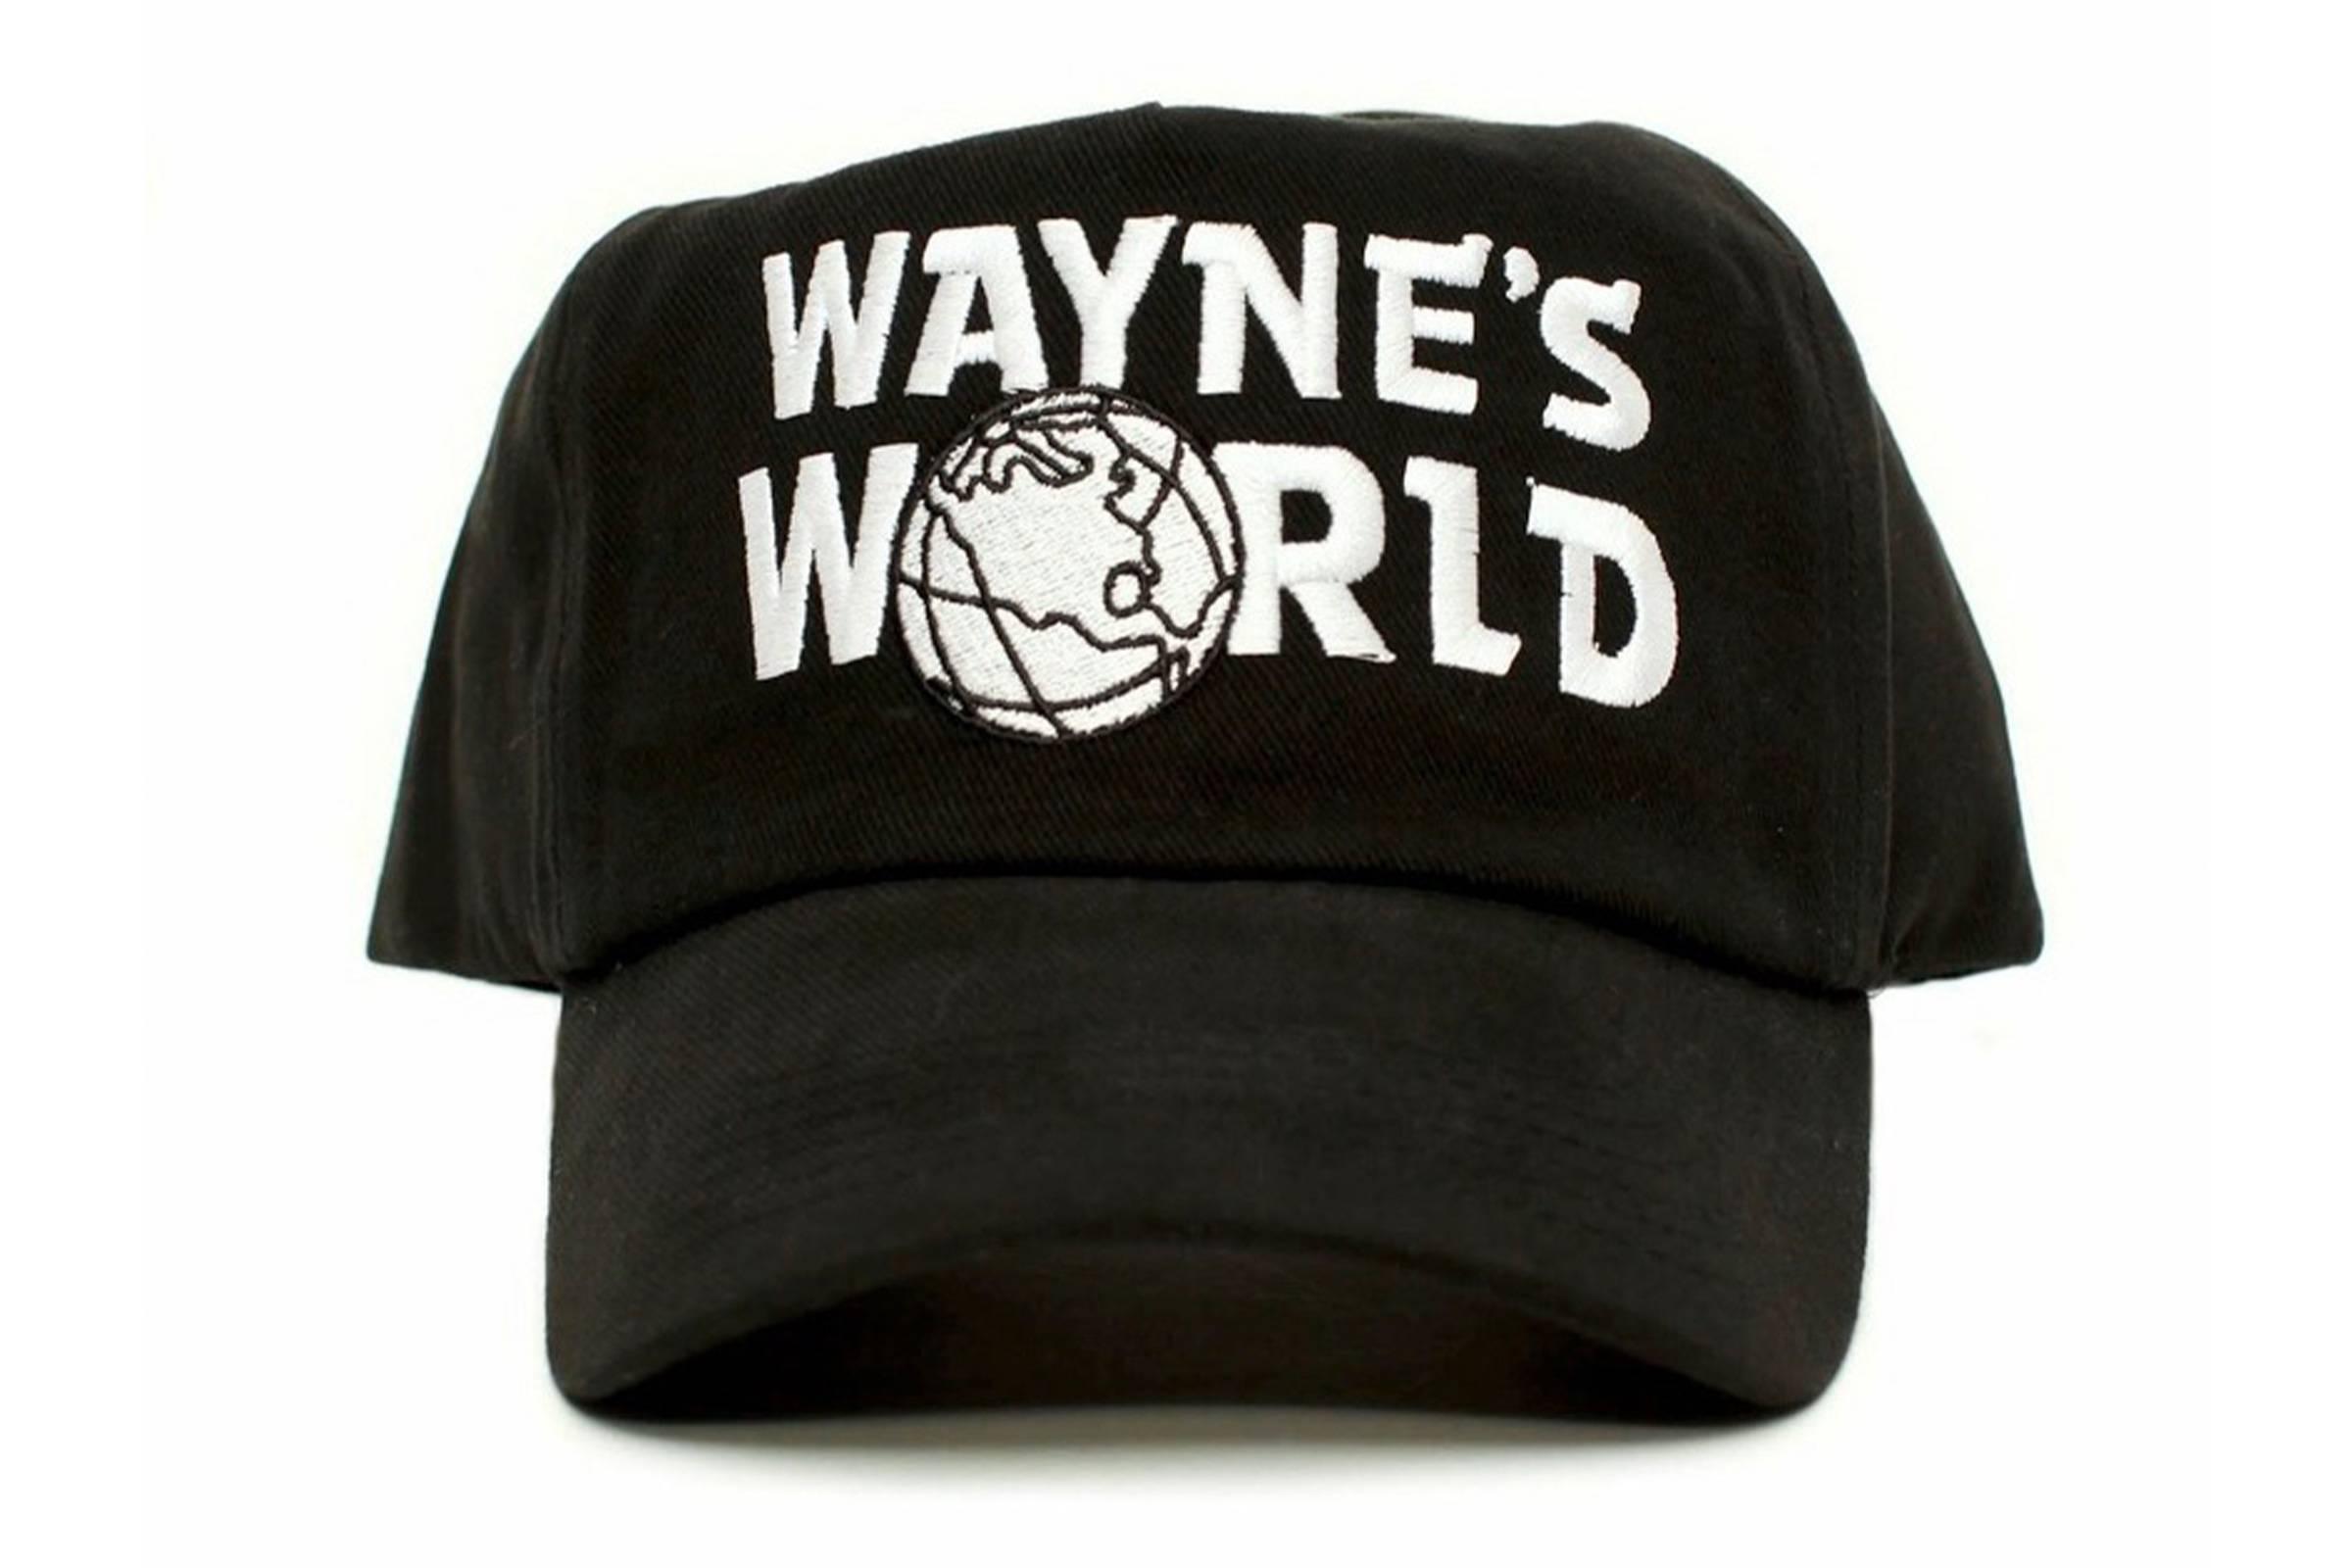 Vintage Wayne's World Cap